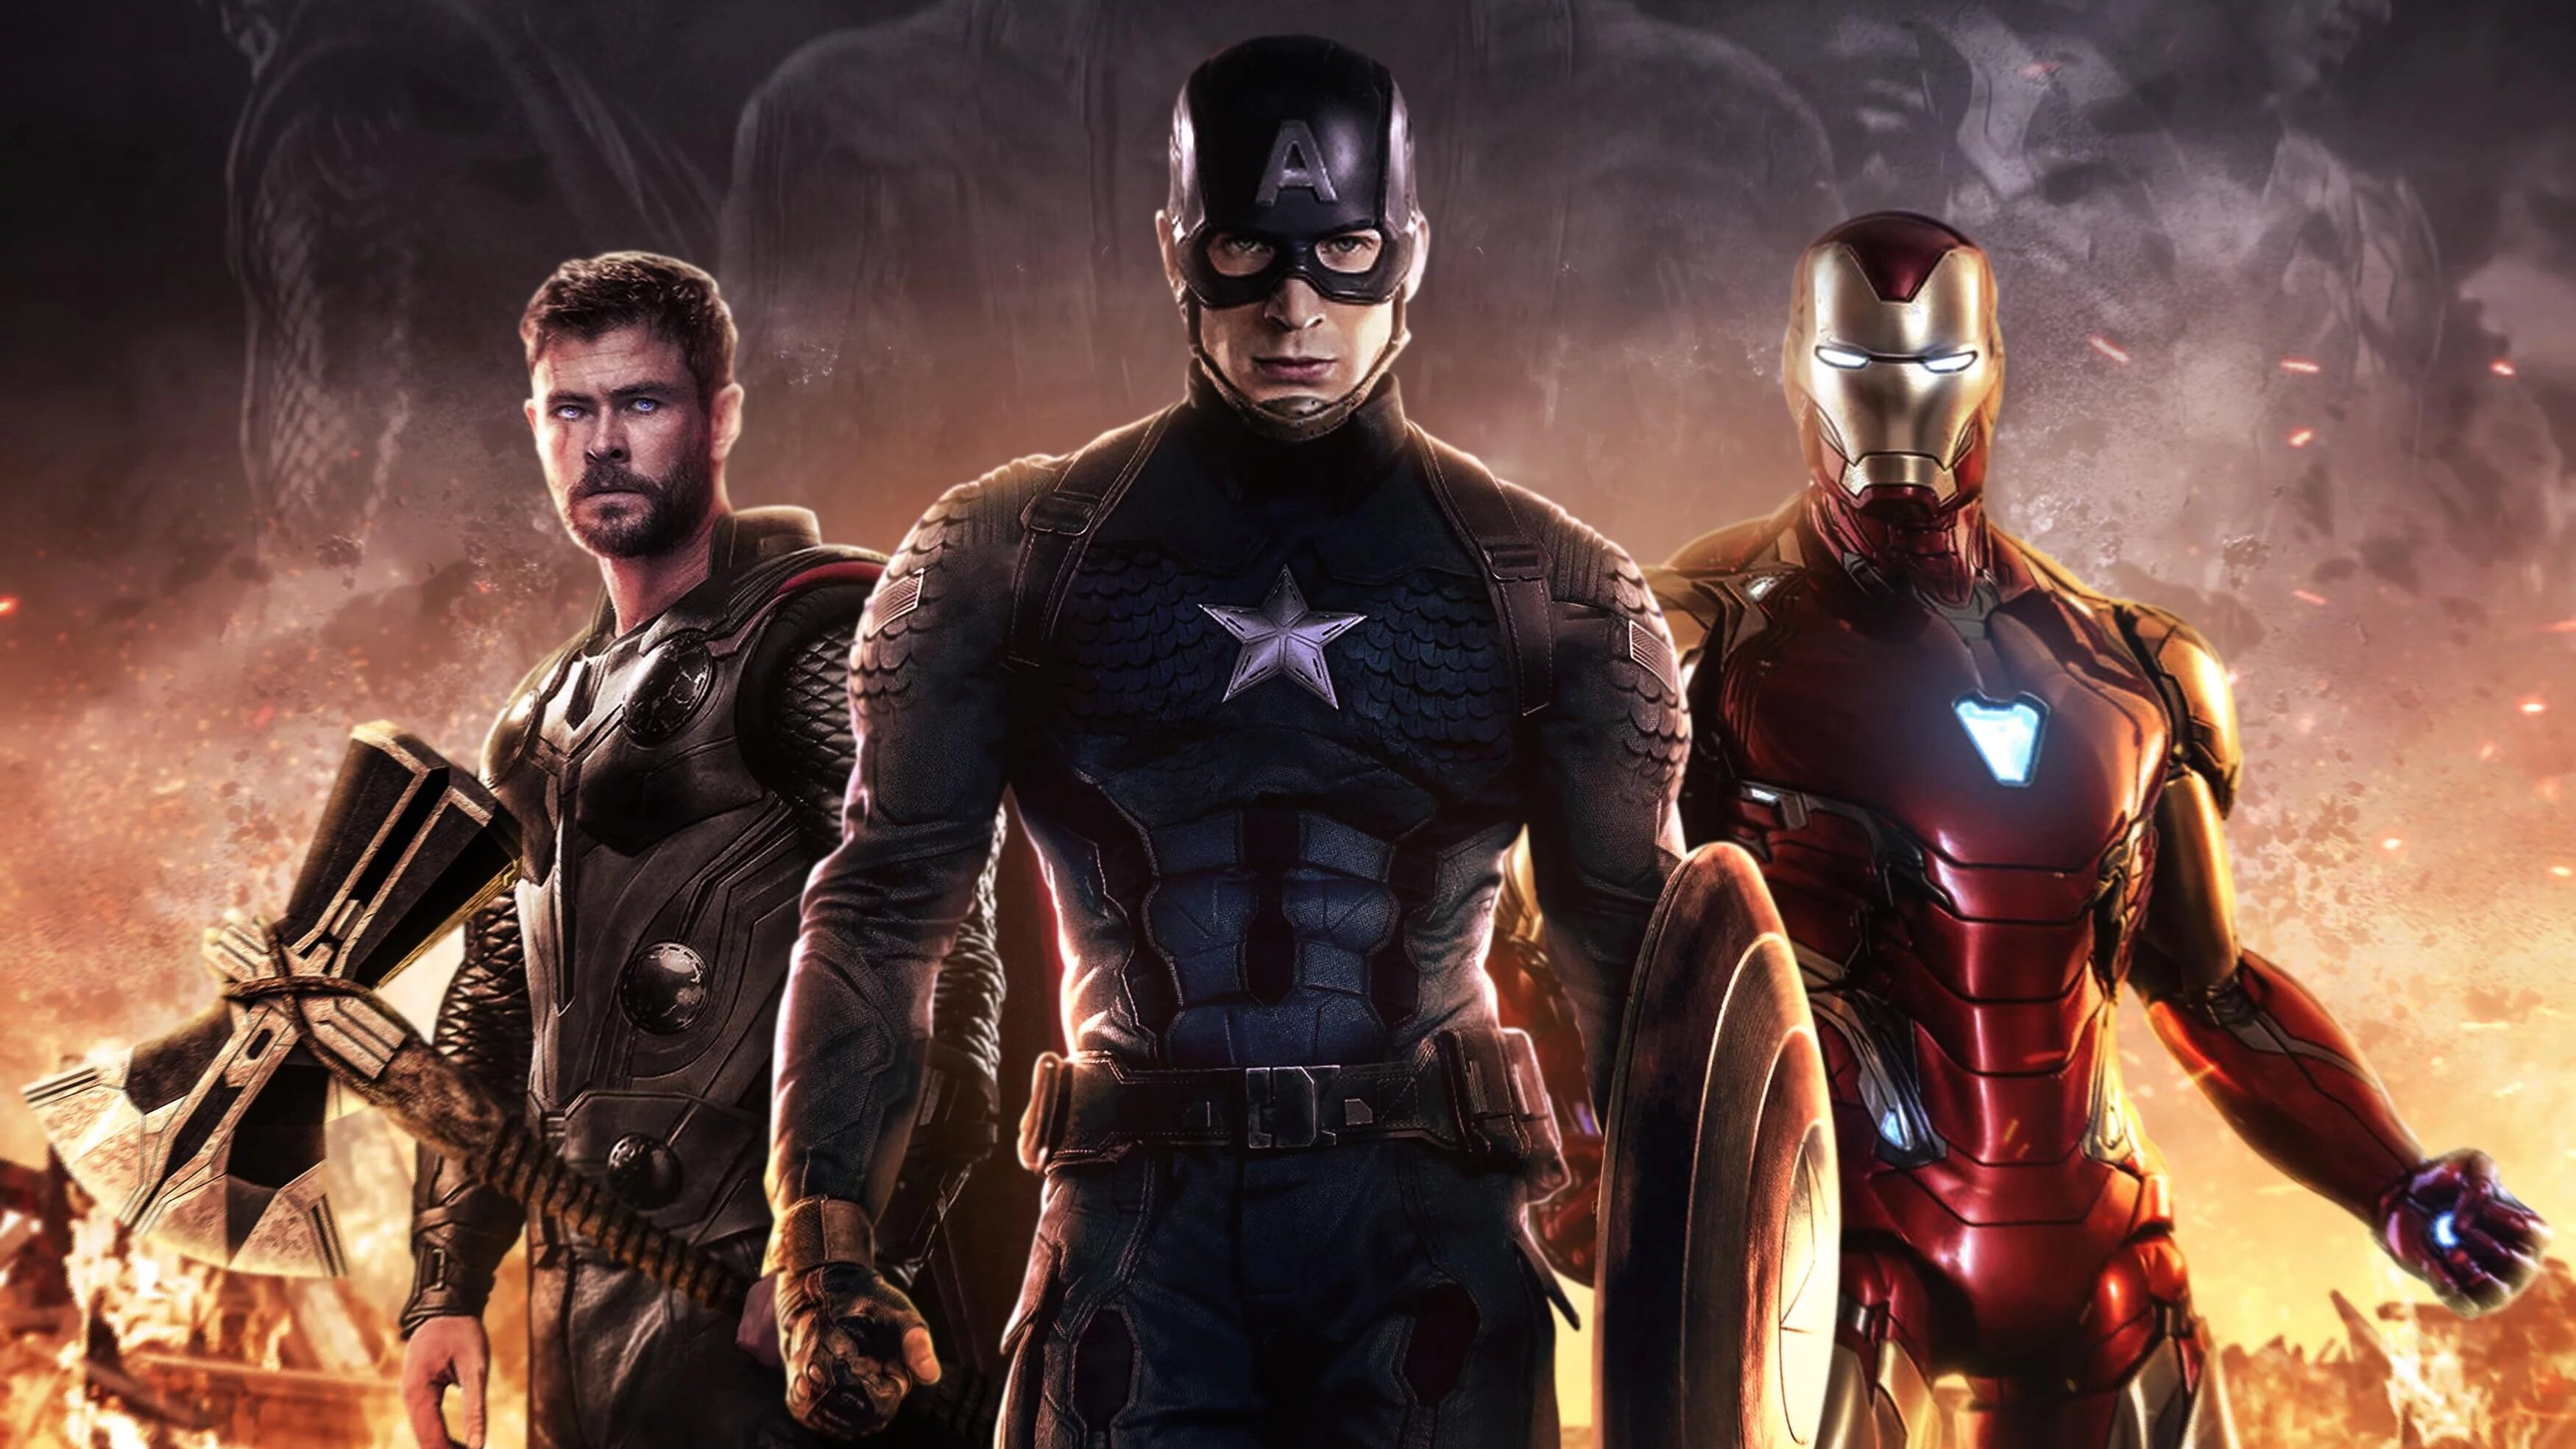 Avengers Endgame Trinity Hd Superheroes 4k Wallpapers Images